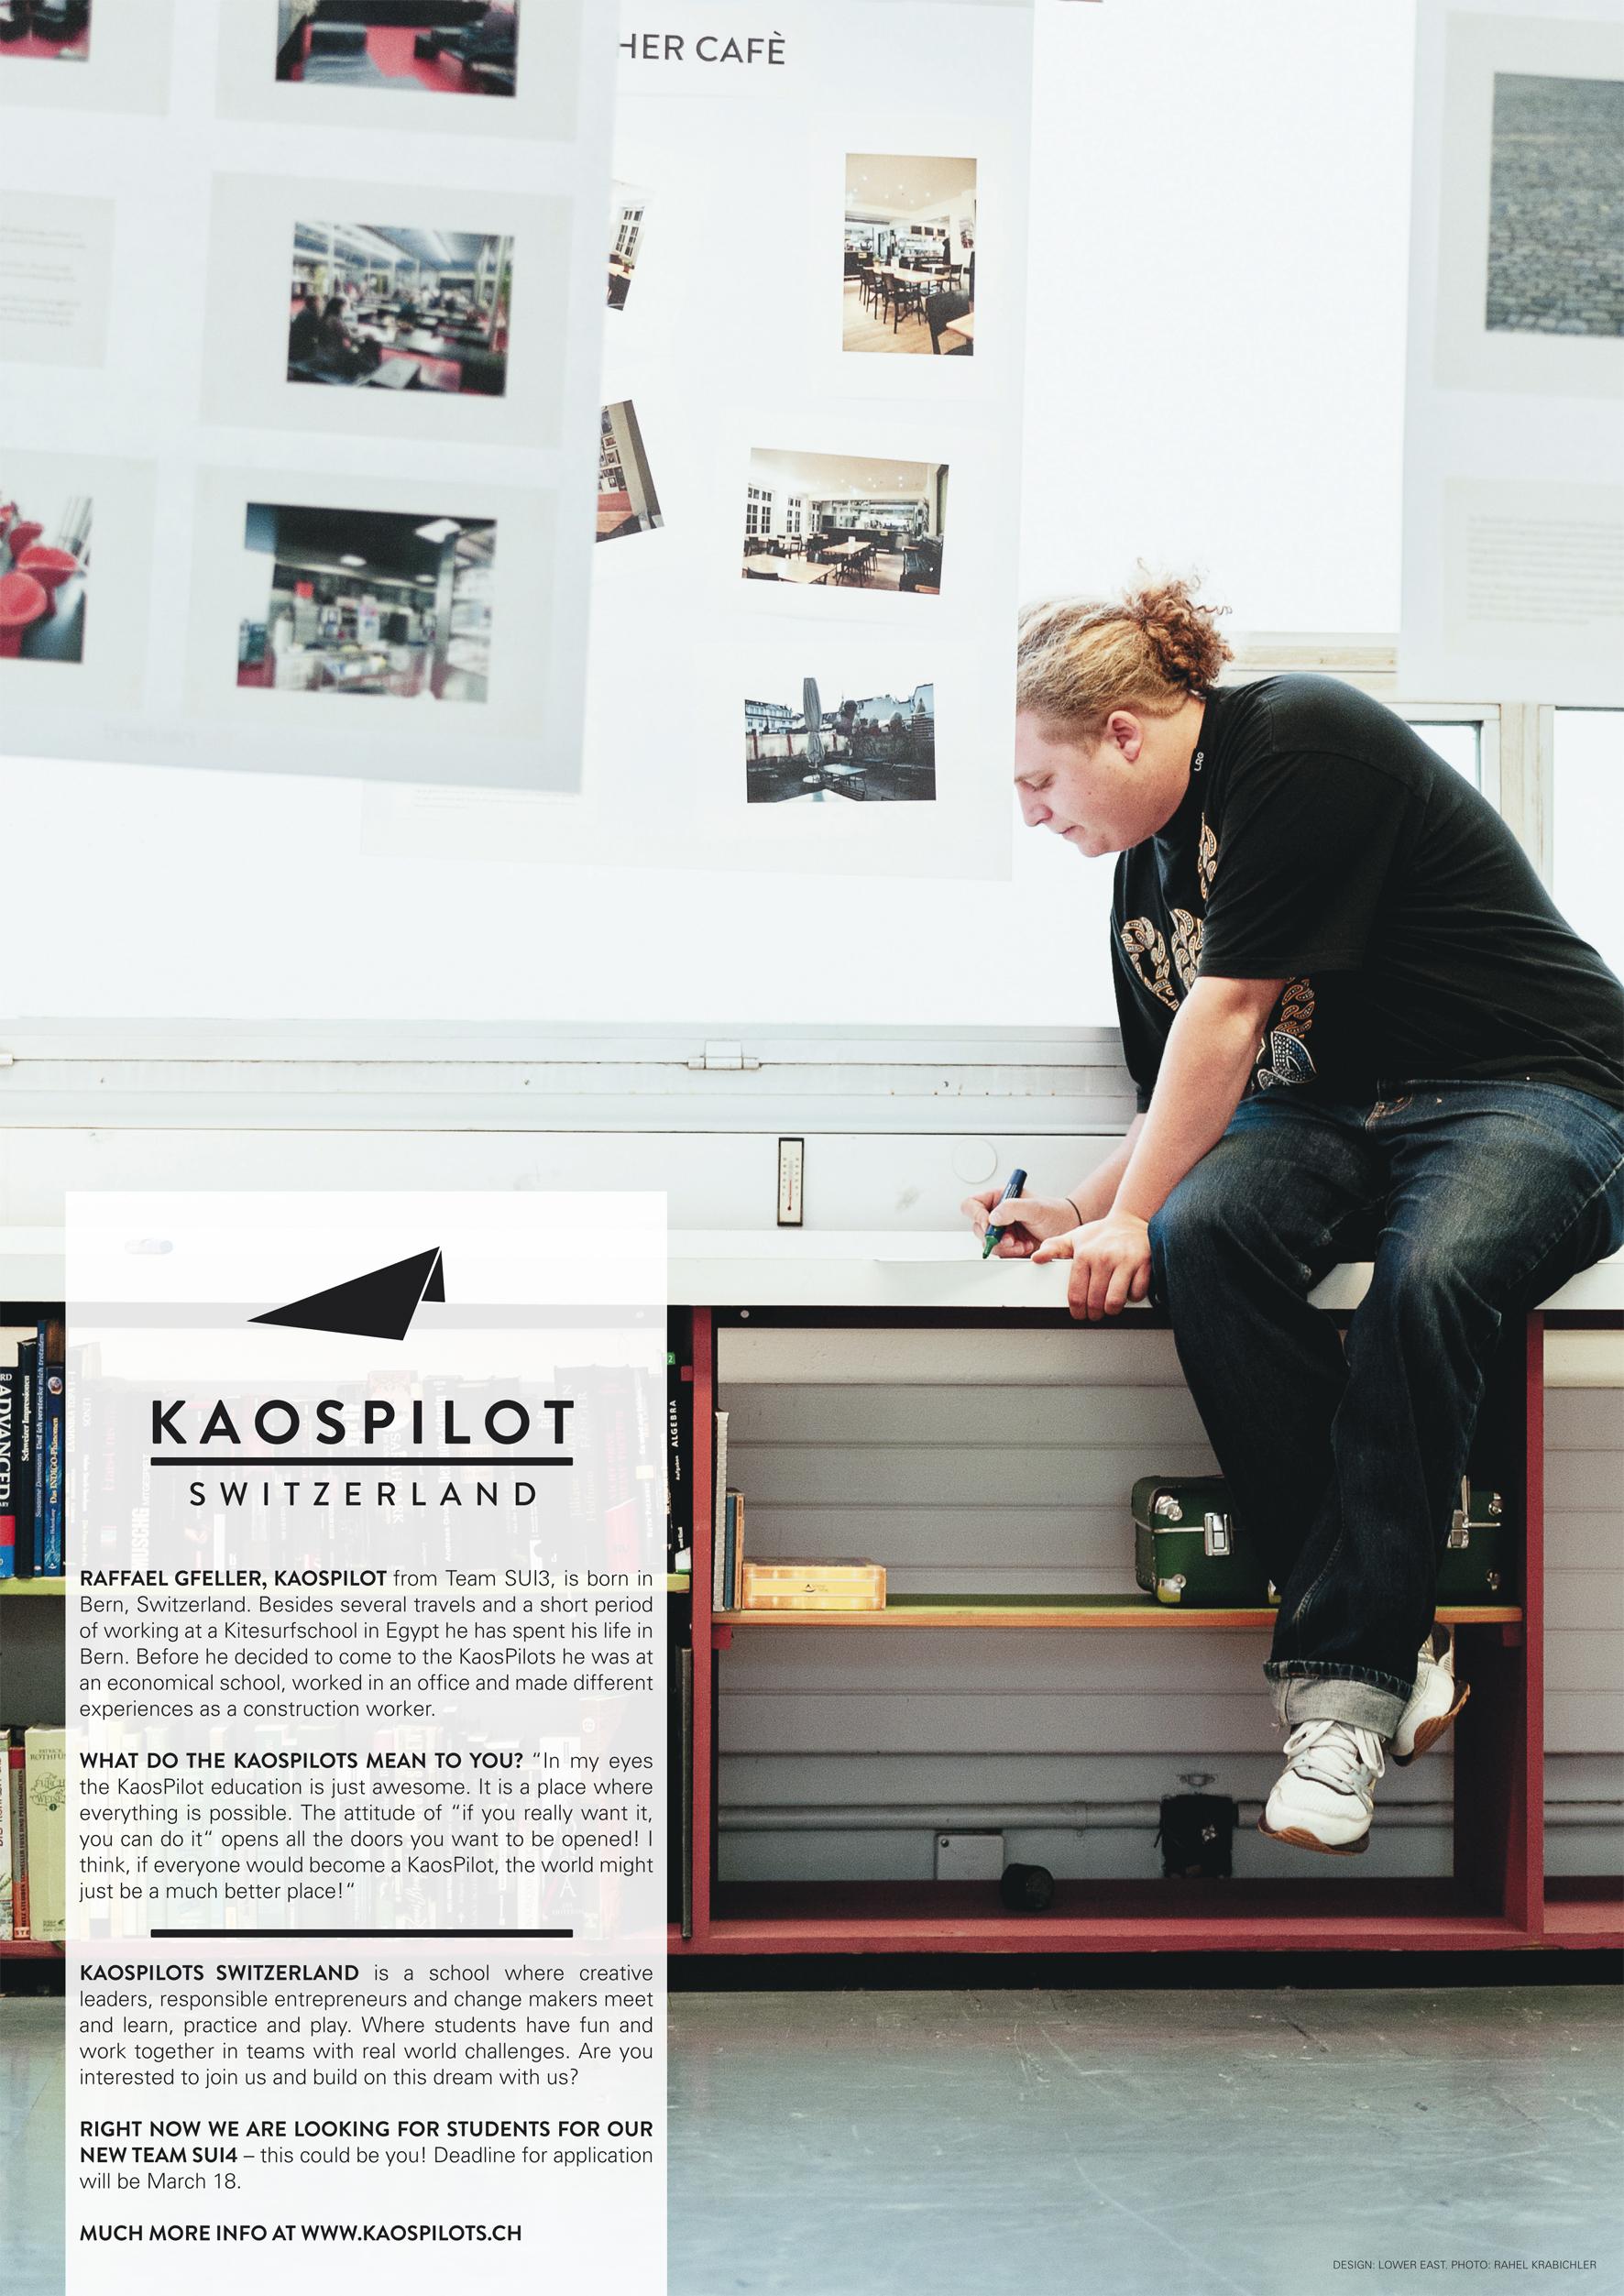 Posters KaosPilots Switzerland. Graphic design: Lower East. Photo: Rahel Krabichler.